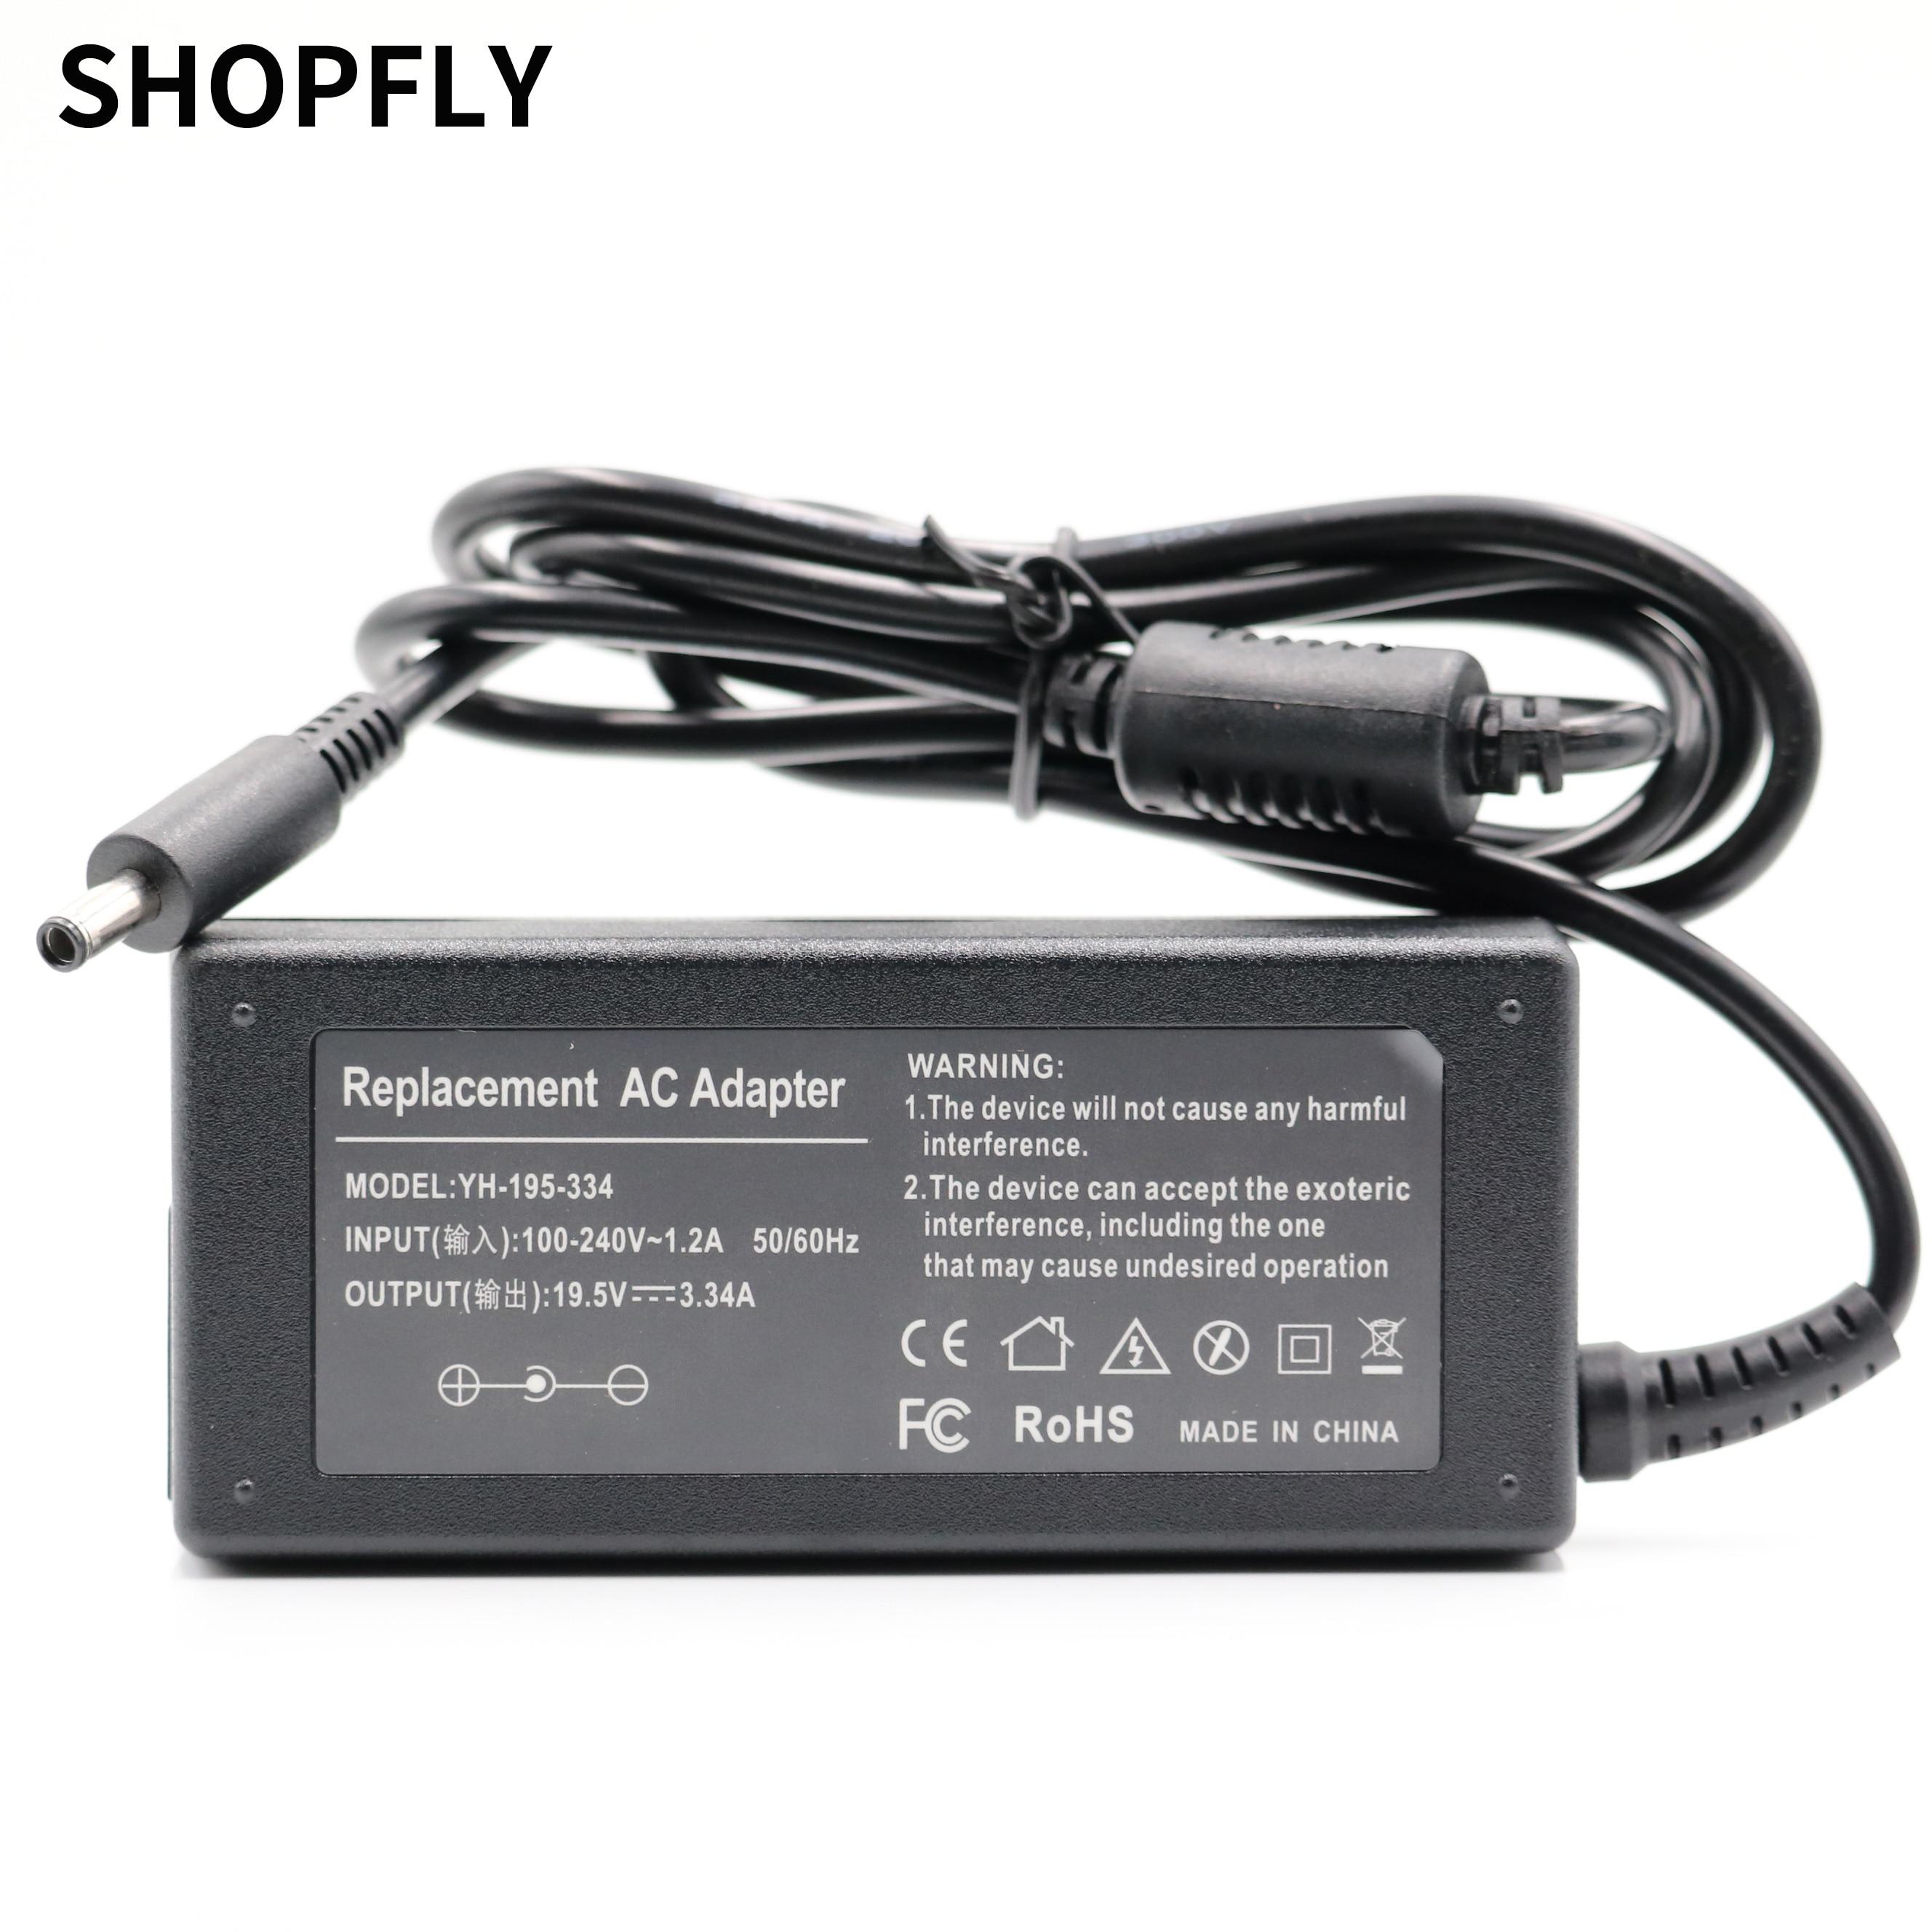 19.5V 3.33A 3.34A Laptop AC power adapter para HP EliteBook 720 725 G1 G2 740 745 750 755 2170p 2540p 2560p 2760p 2510P